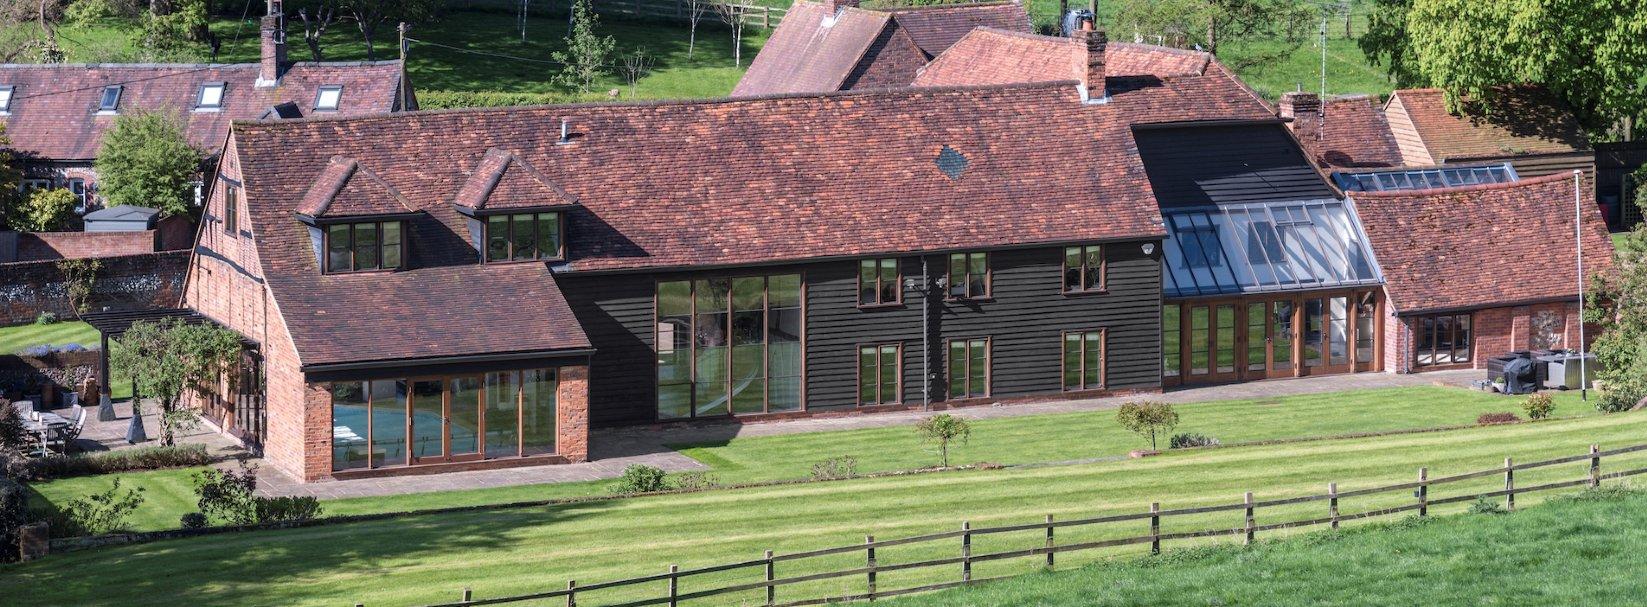 Old Tythe Barn, Speen Road, North Dean, High Wycombe, Buckinghamshire